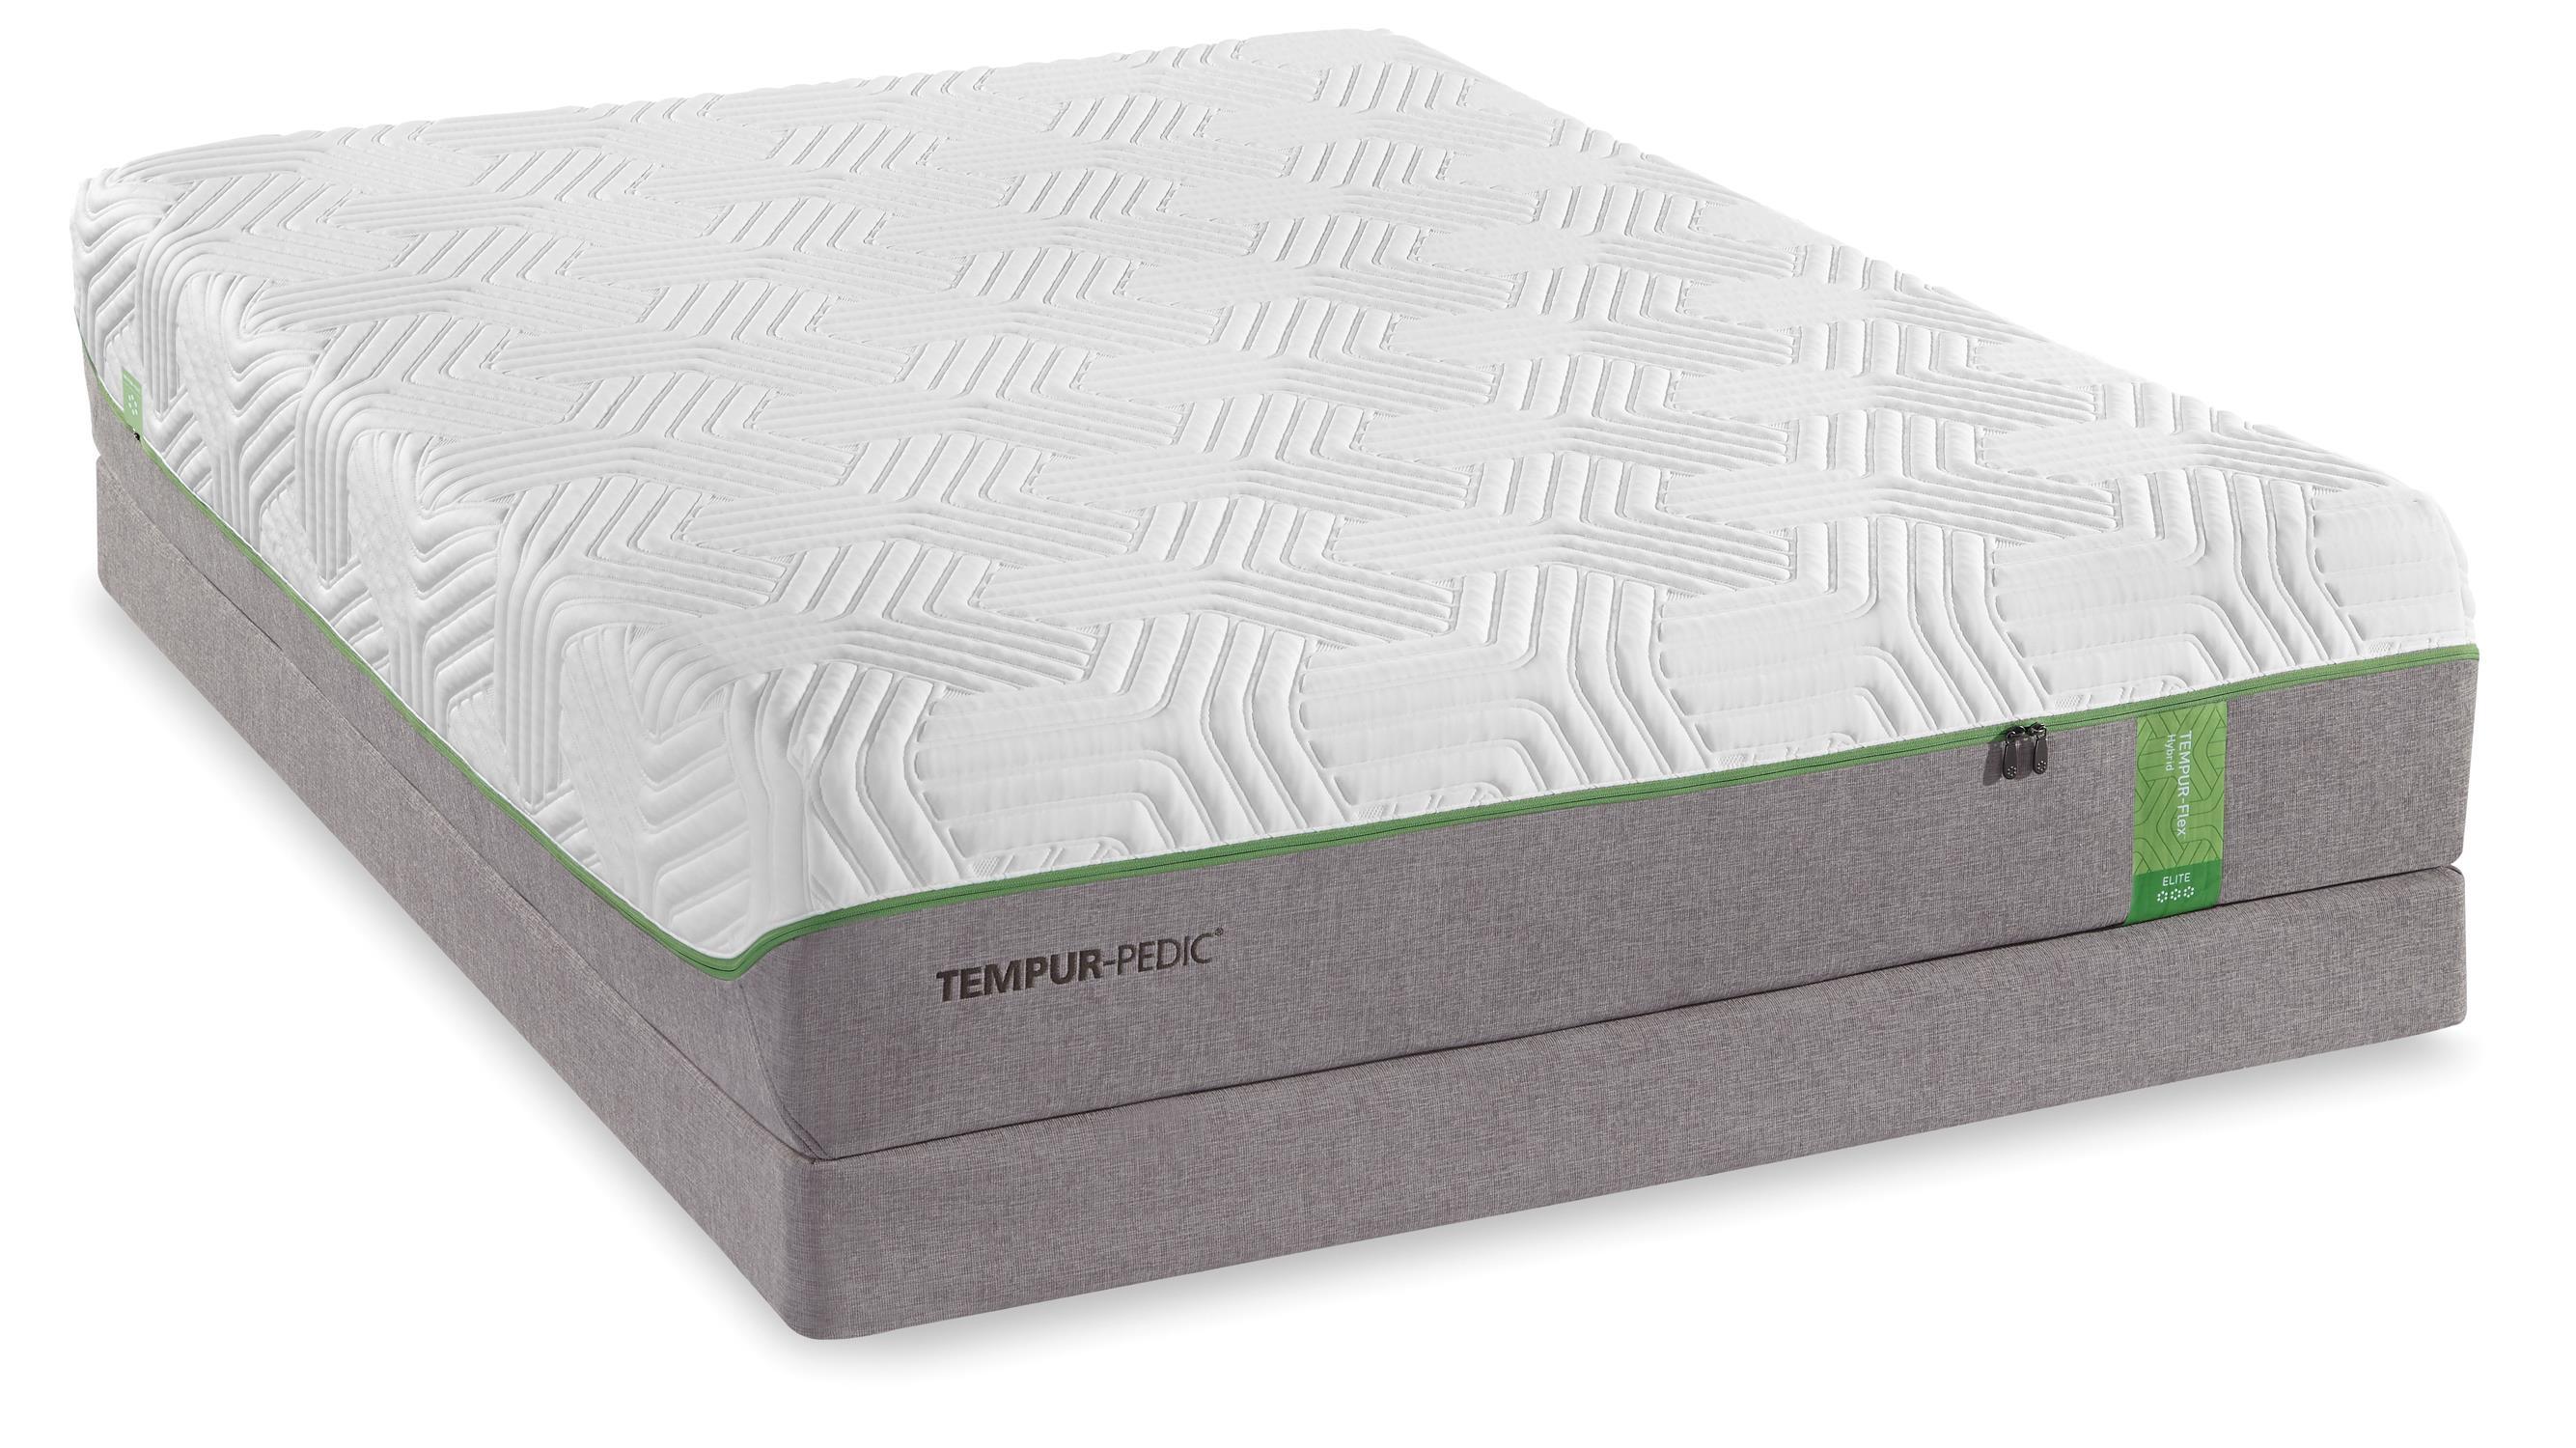 Tempur-Pedic® TEMPUR-Flex Elite Cal King Medium Soft Plush Mattress Set - Item Number: 10117180+2x21510190